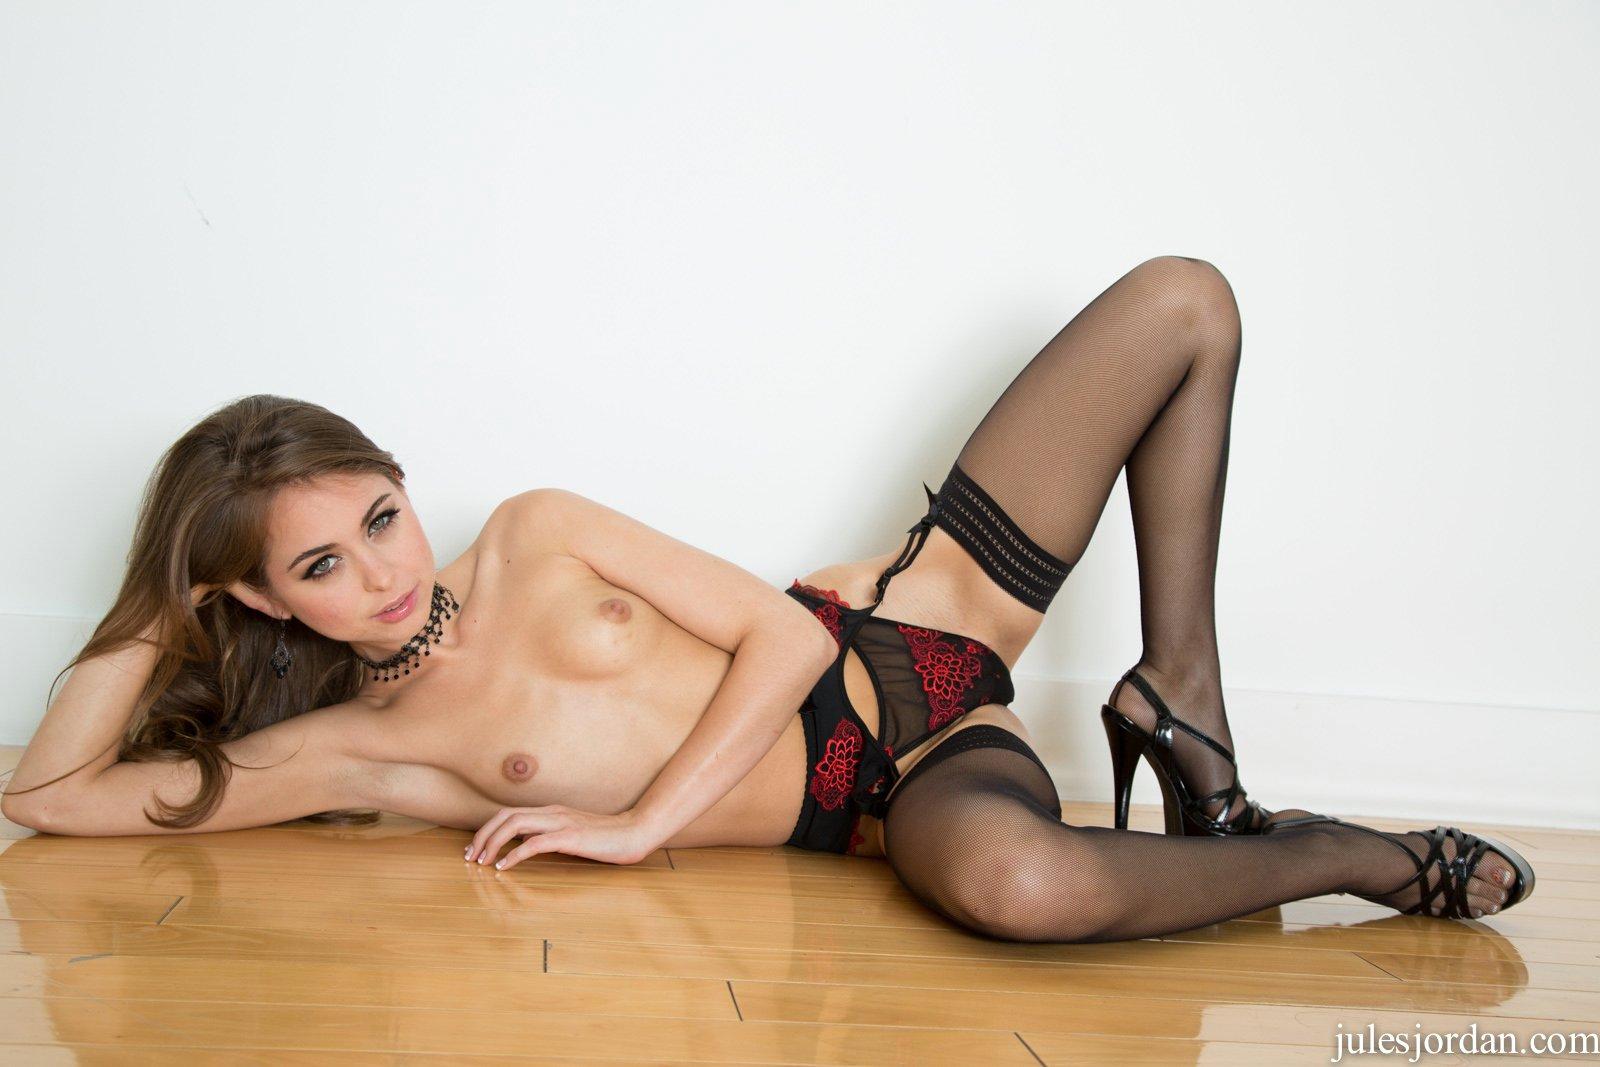 leilene nude pics